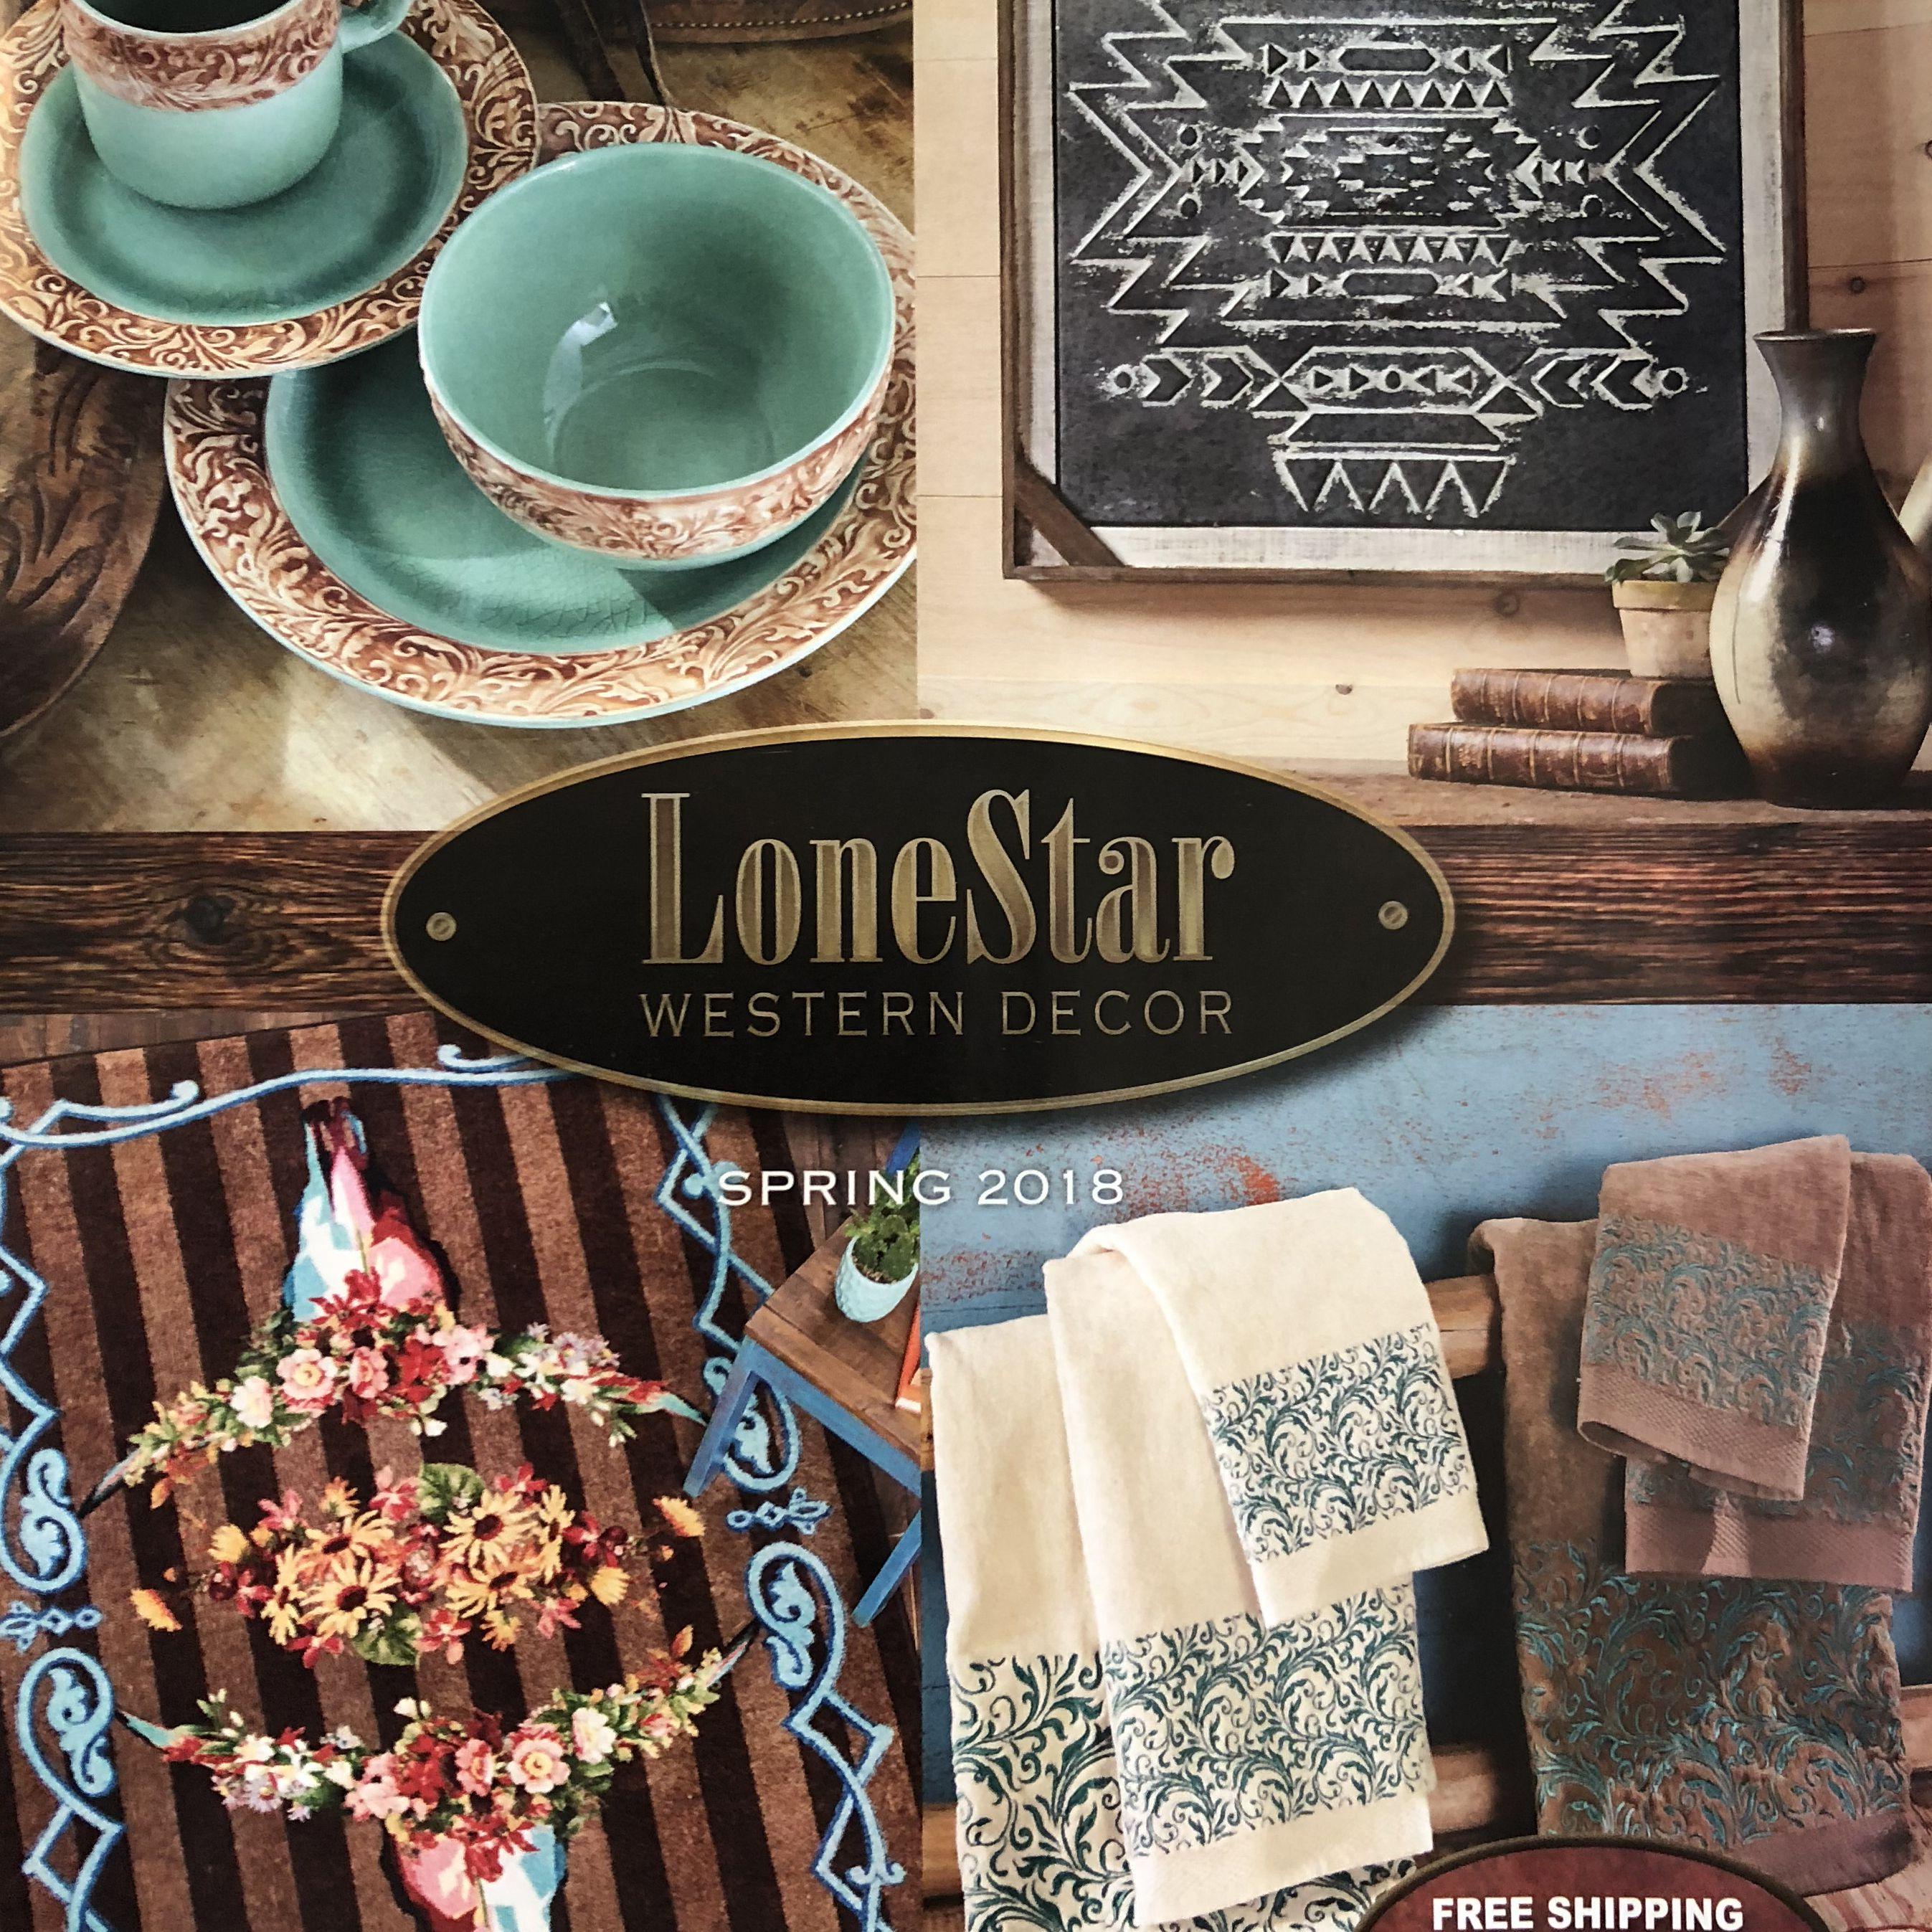 Lonestar Western Decor Catalog